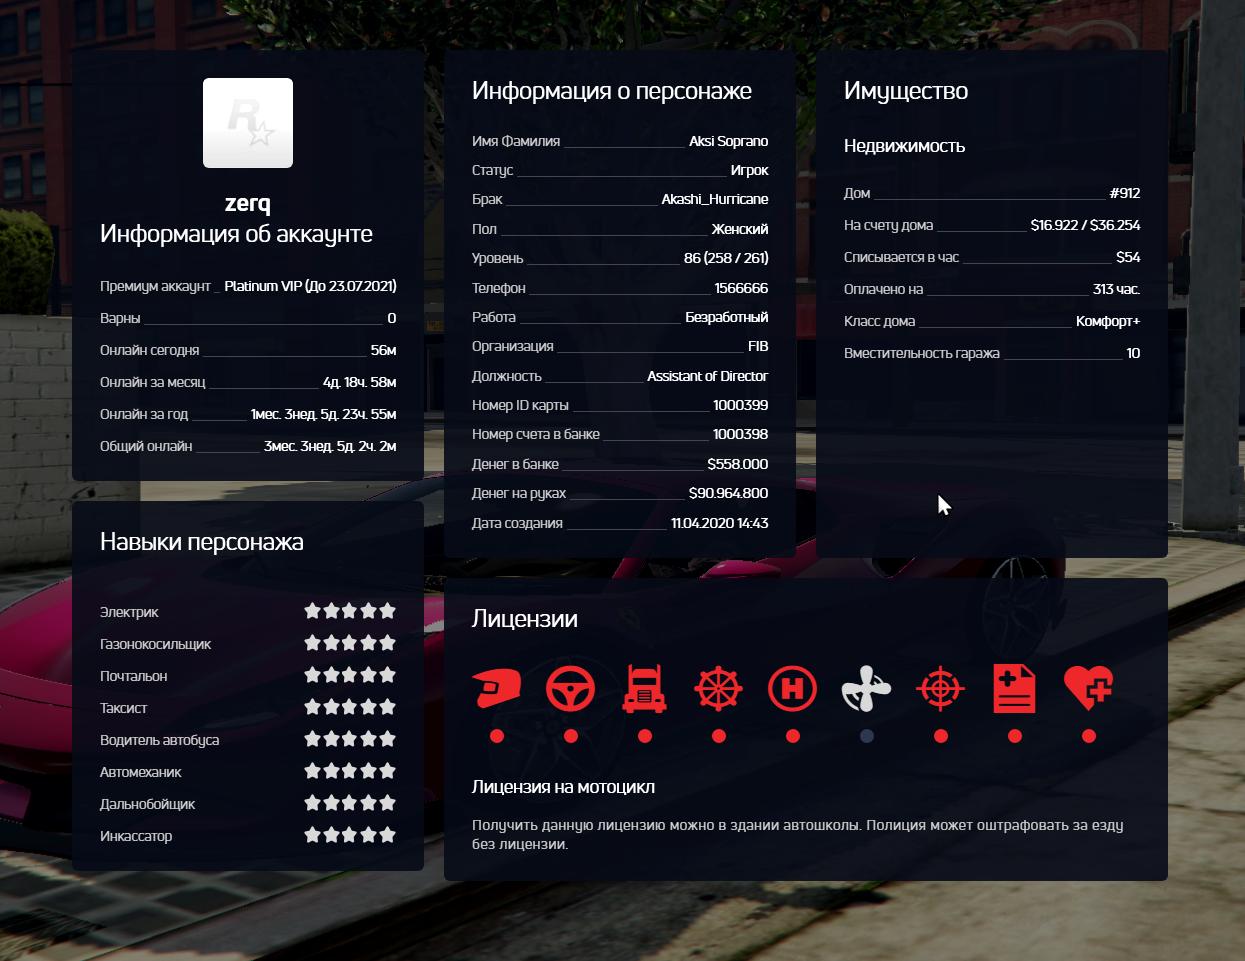 Grand_Theft_Auto_V_Screenshot_2021.07.11_-_14.59.05.76.png